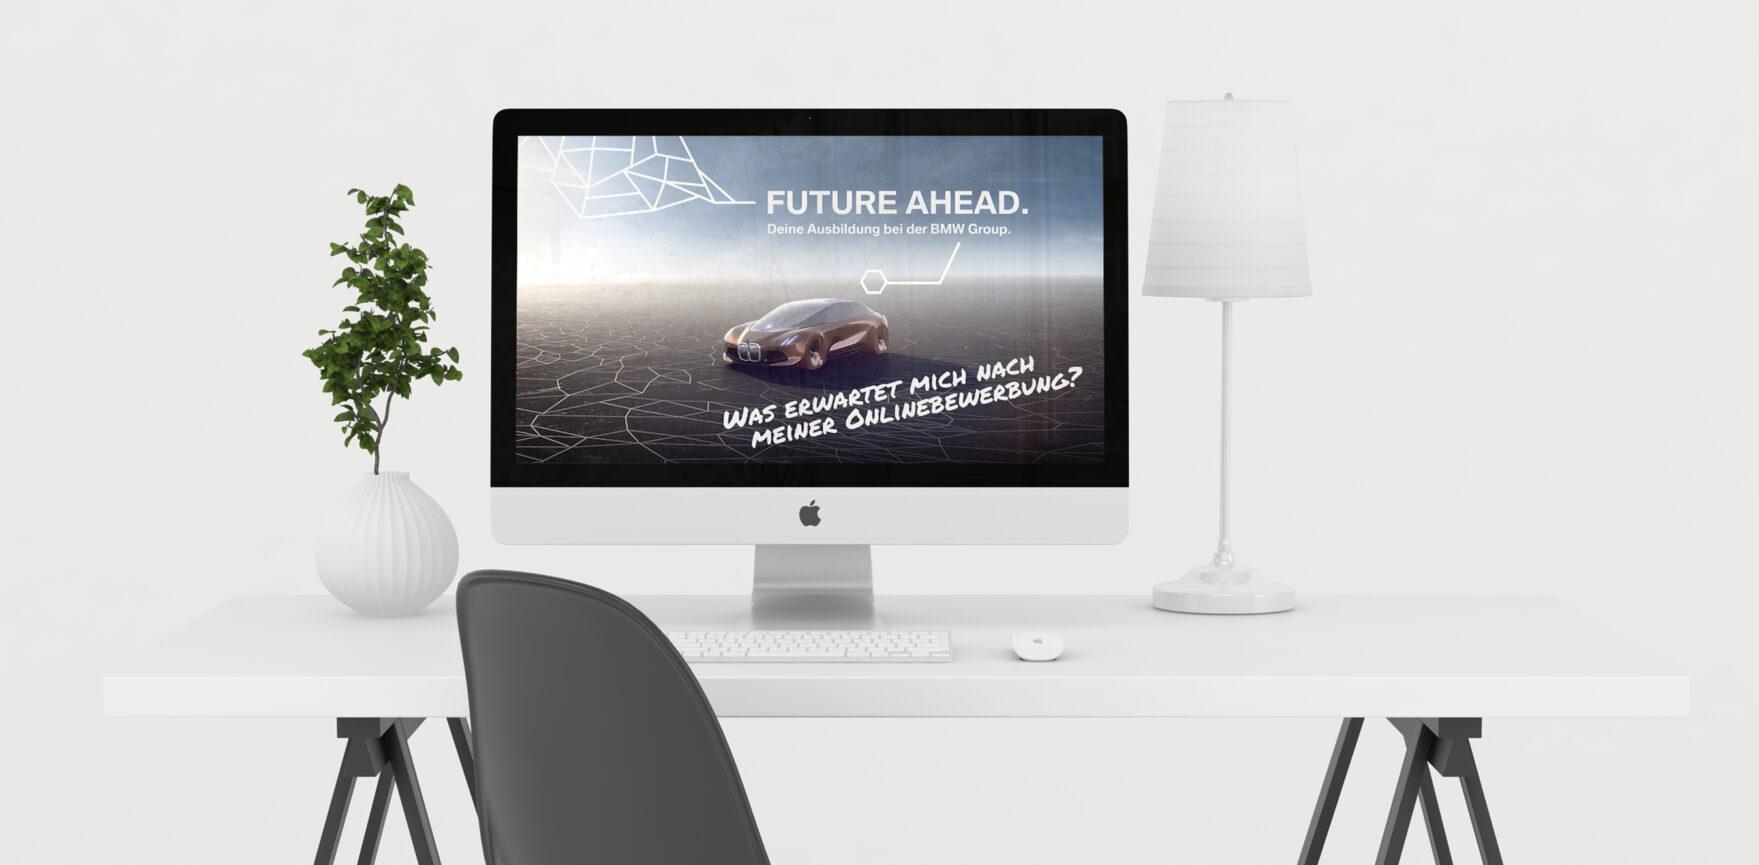 iMac mit Standbild BMW Social Media Clip Recruiting